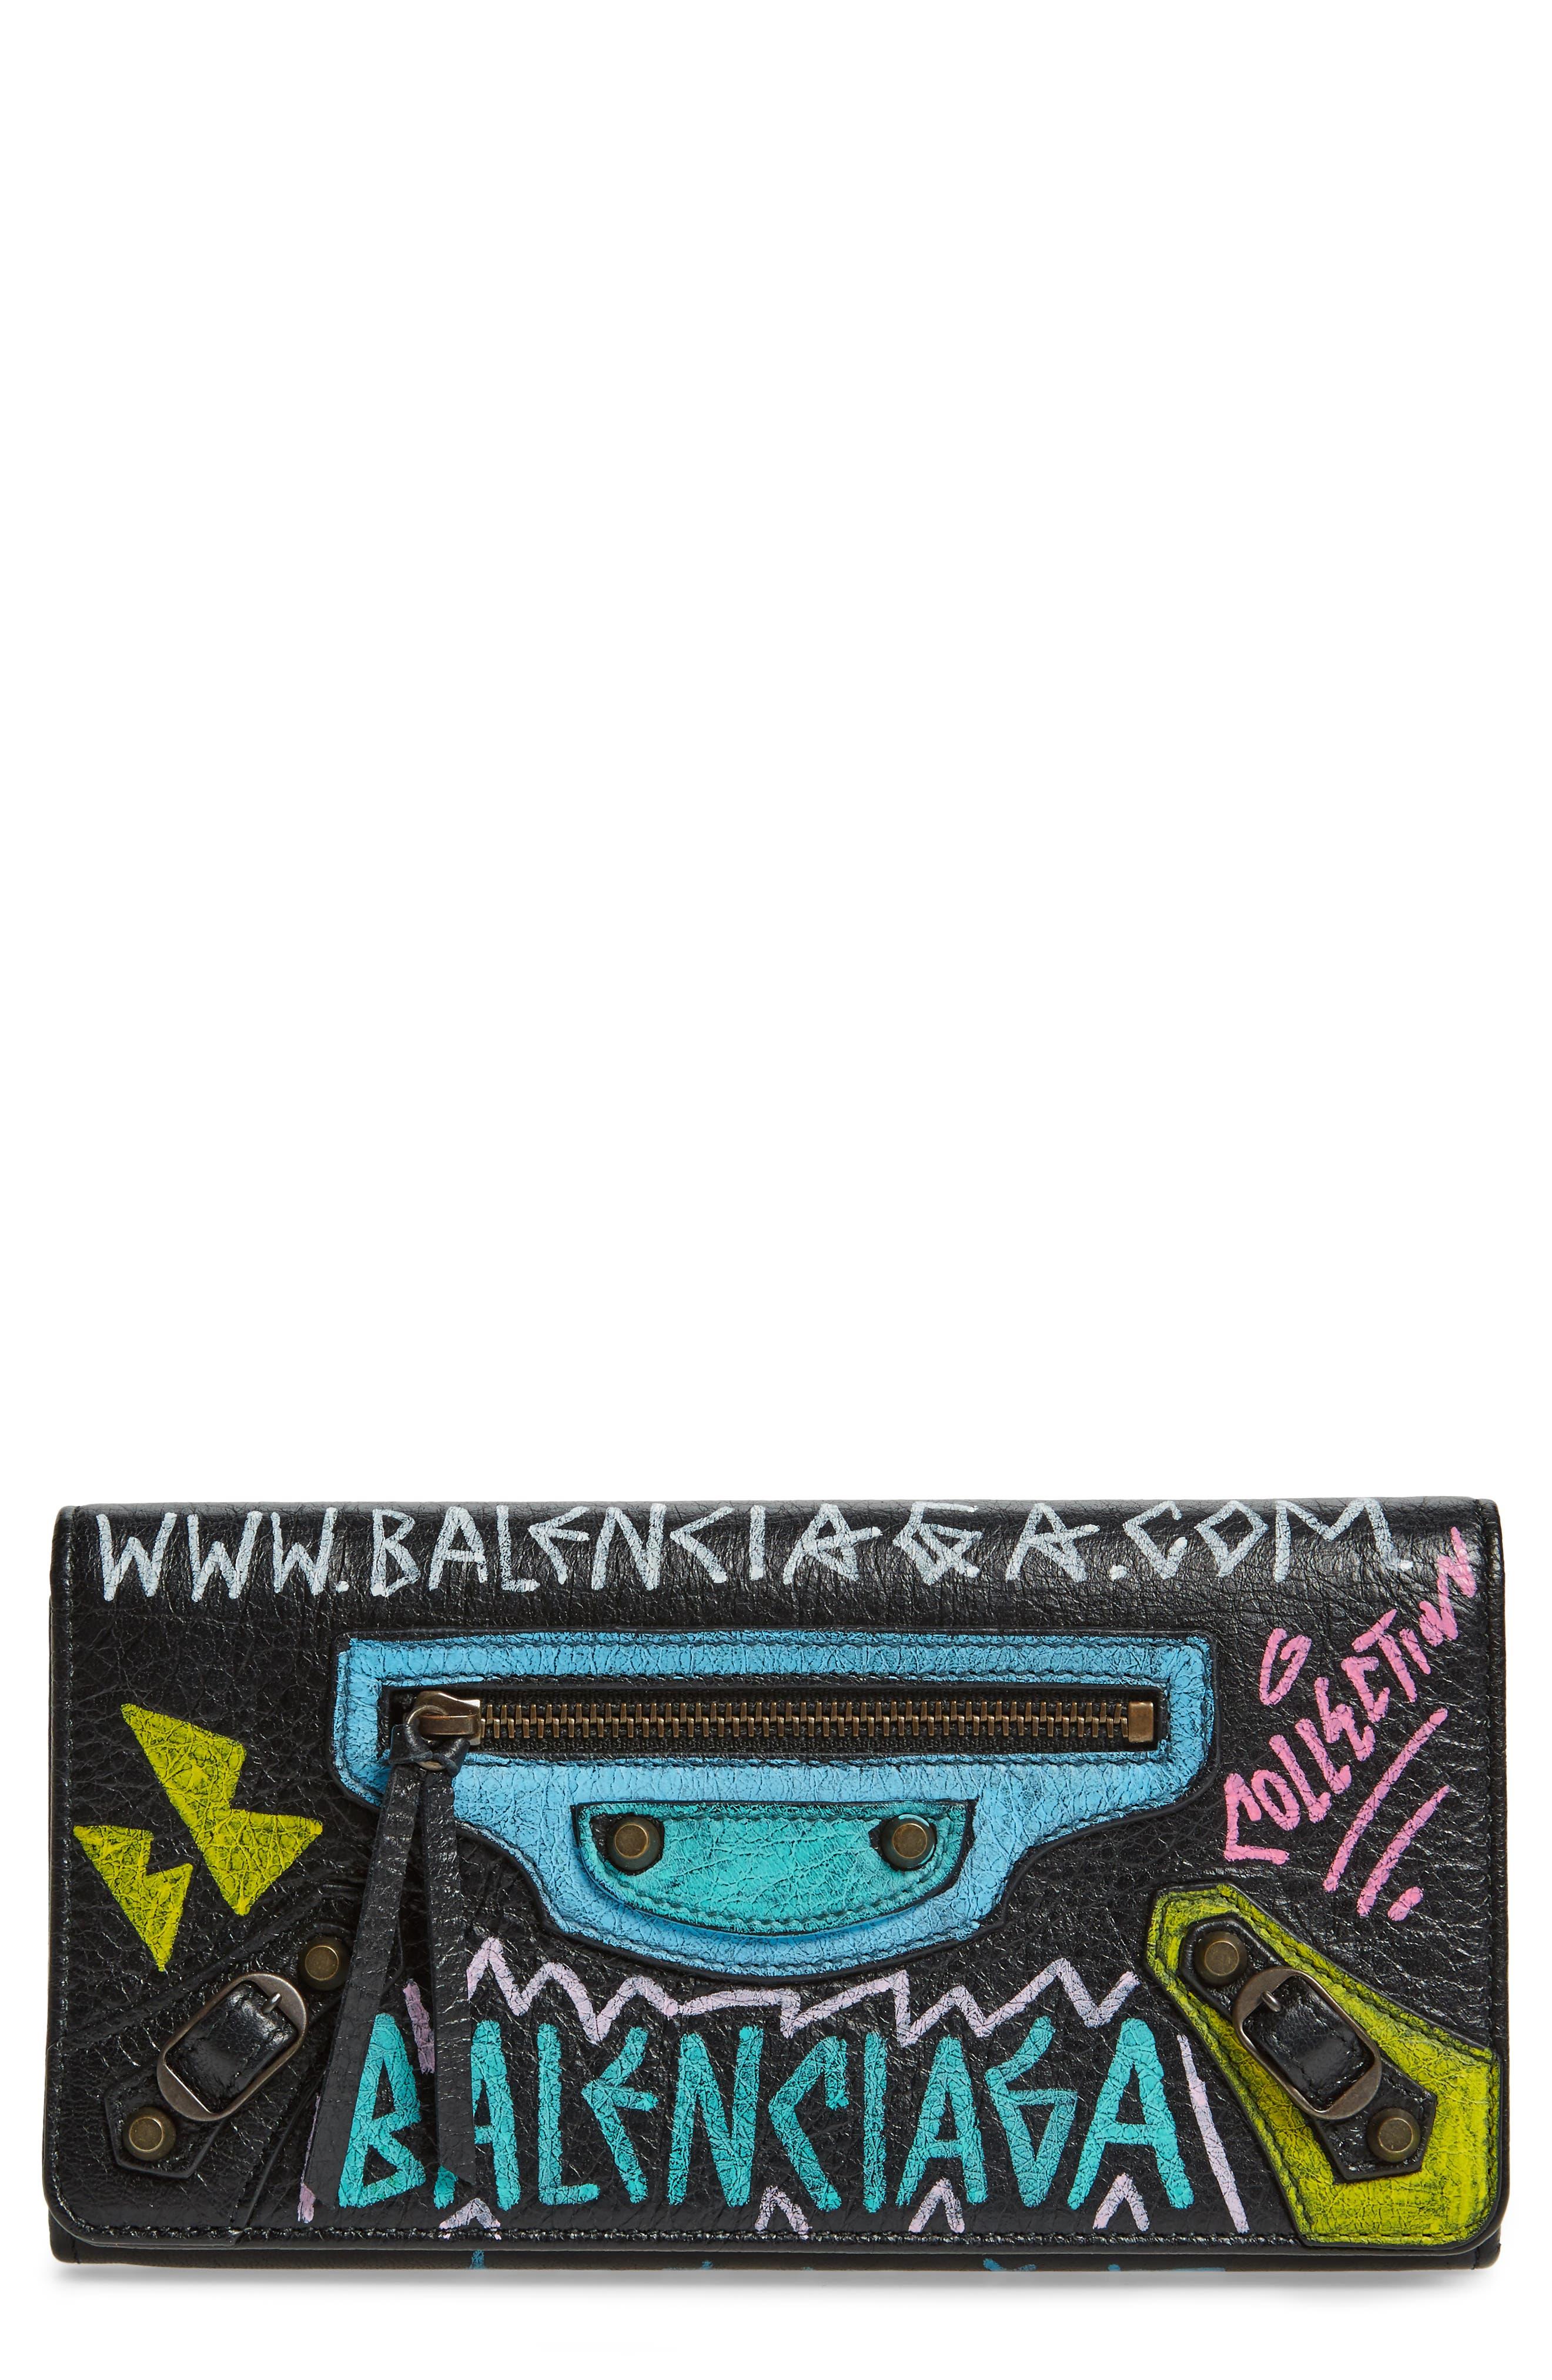 Classic Graffiti Leather Wallet,                             Main thumbnail 1, color,                             006